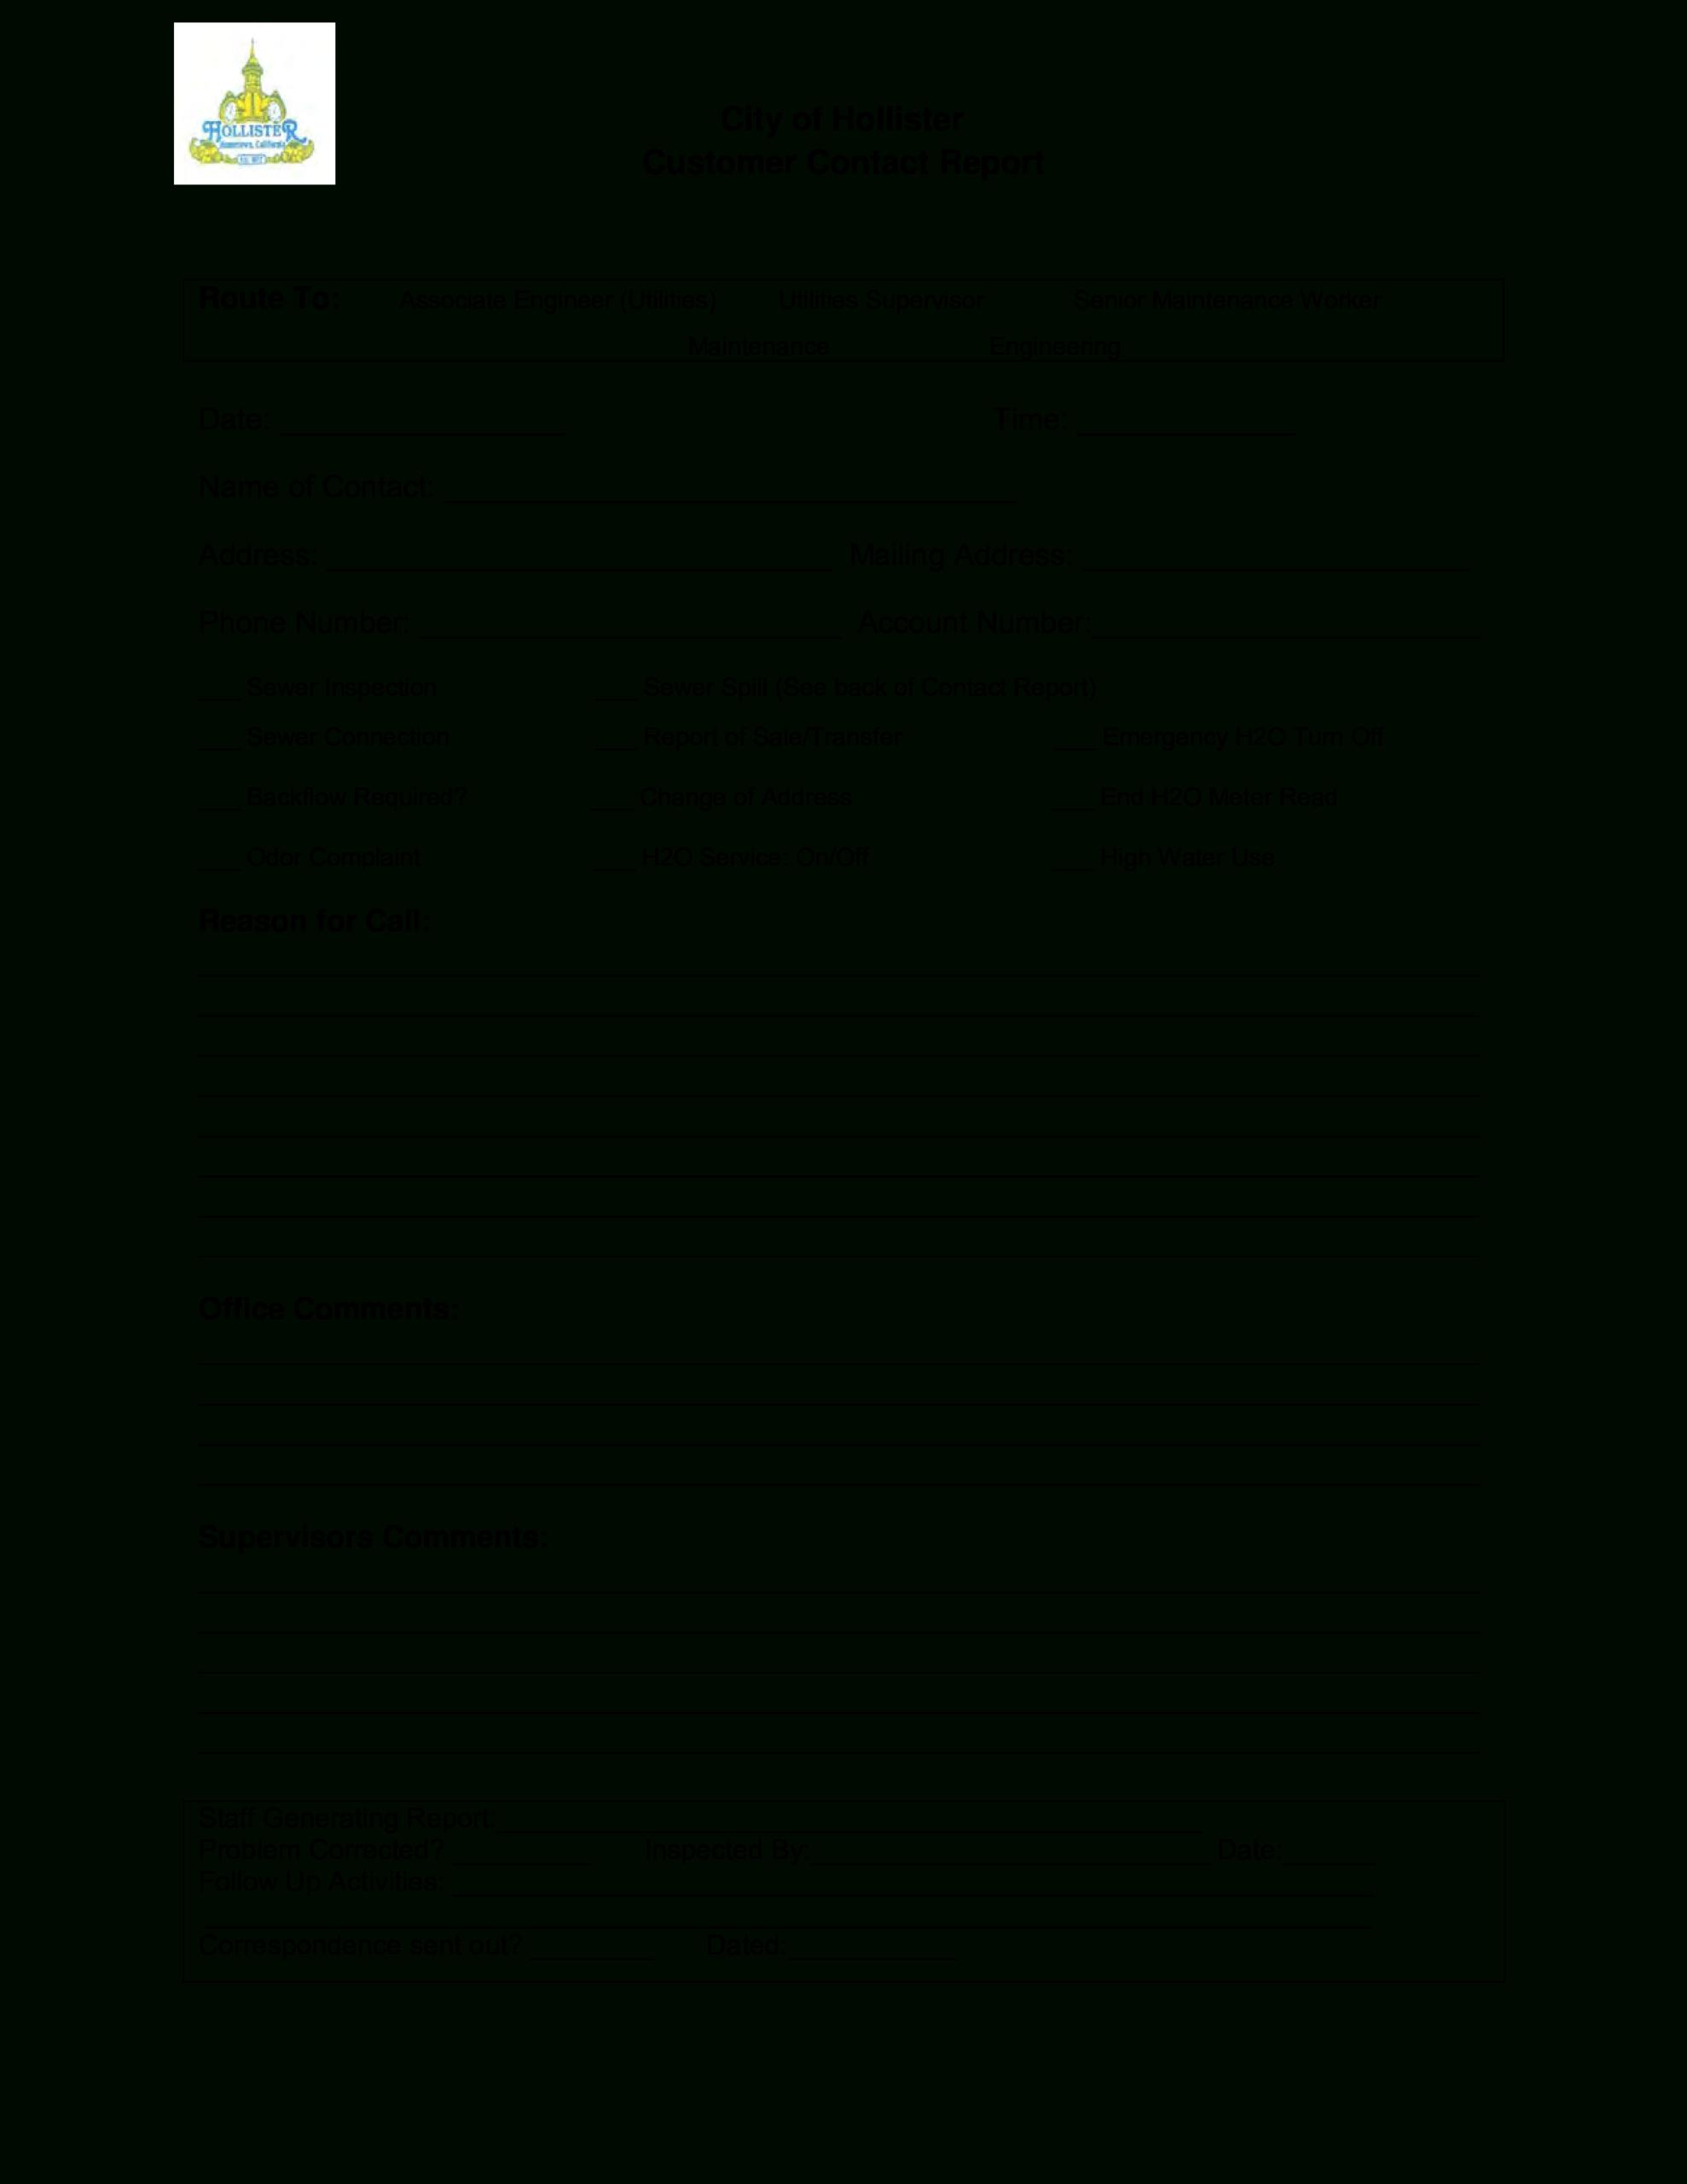 Customer Contact Report   Templates At Allbusinesstemplates With Regard To Customer Contact Report Template